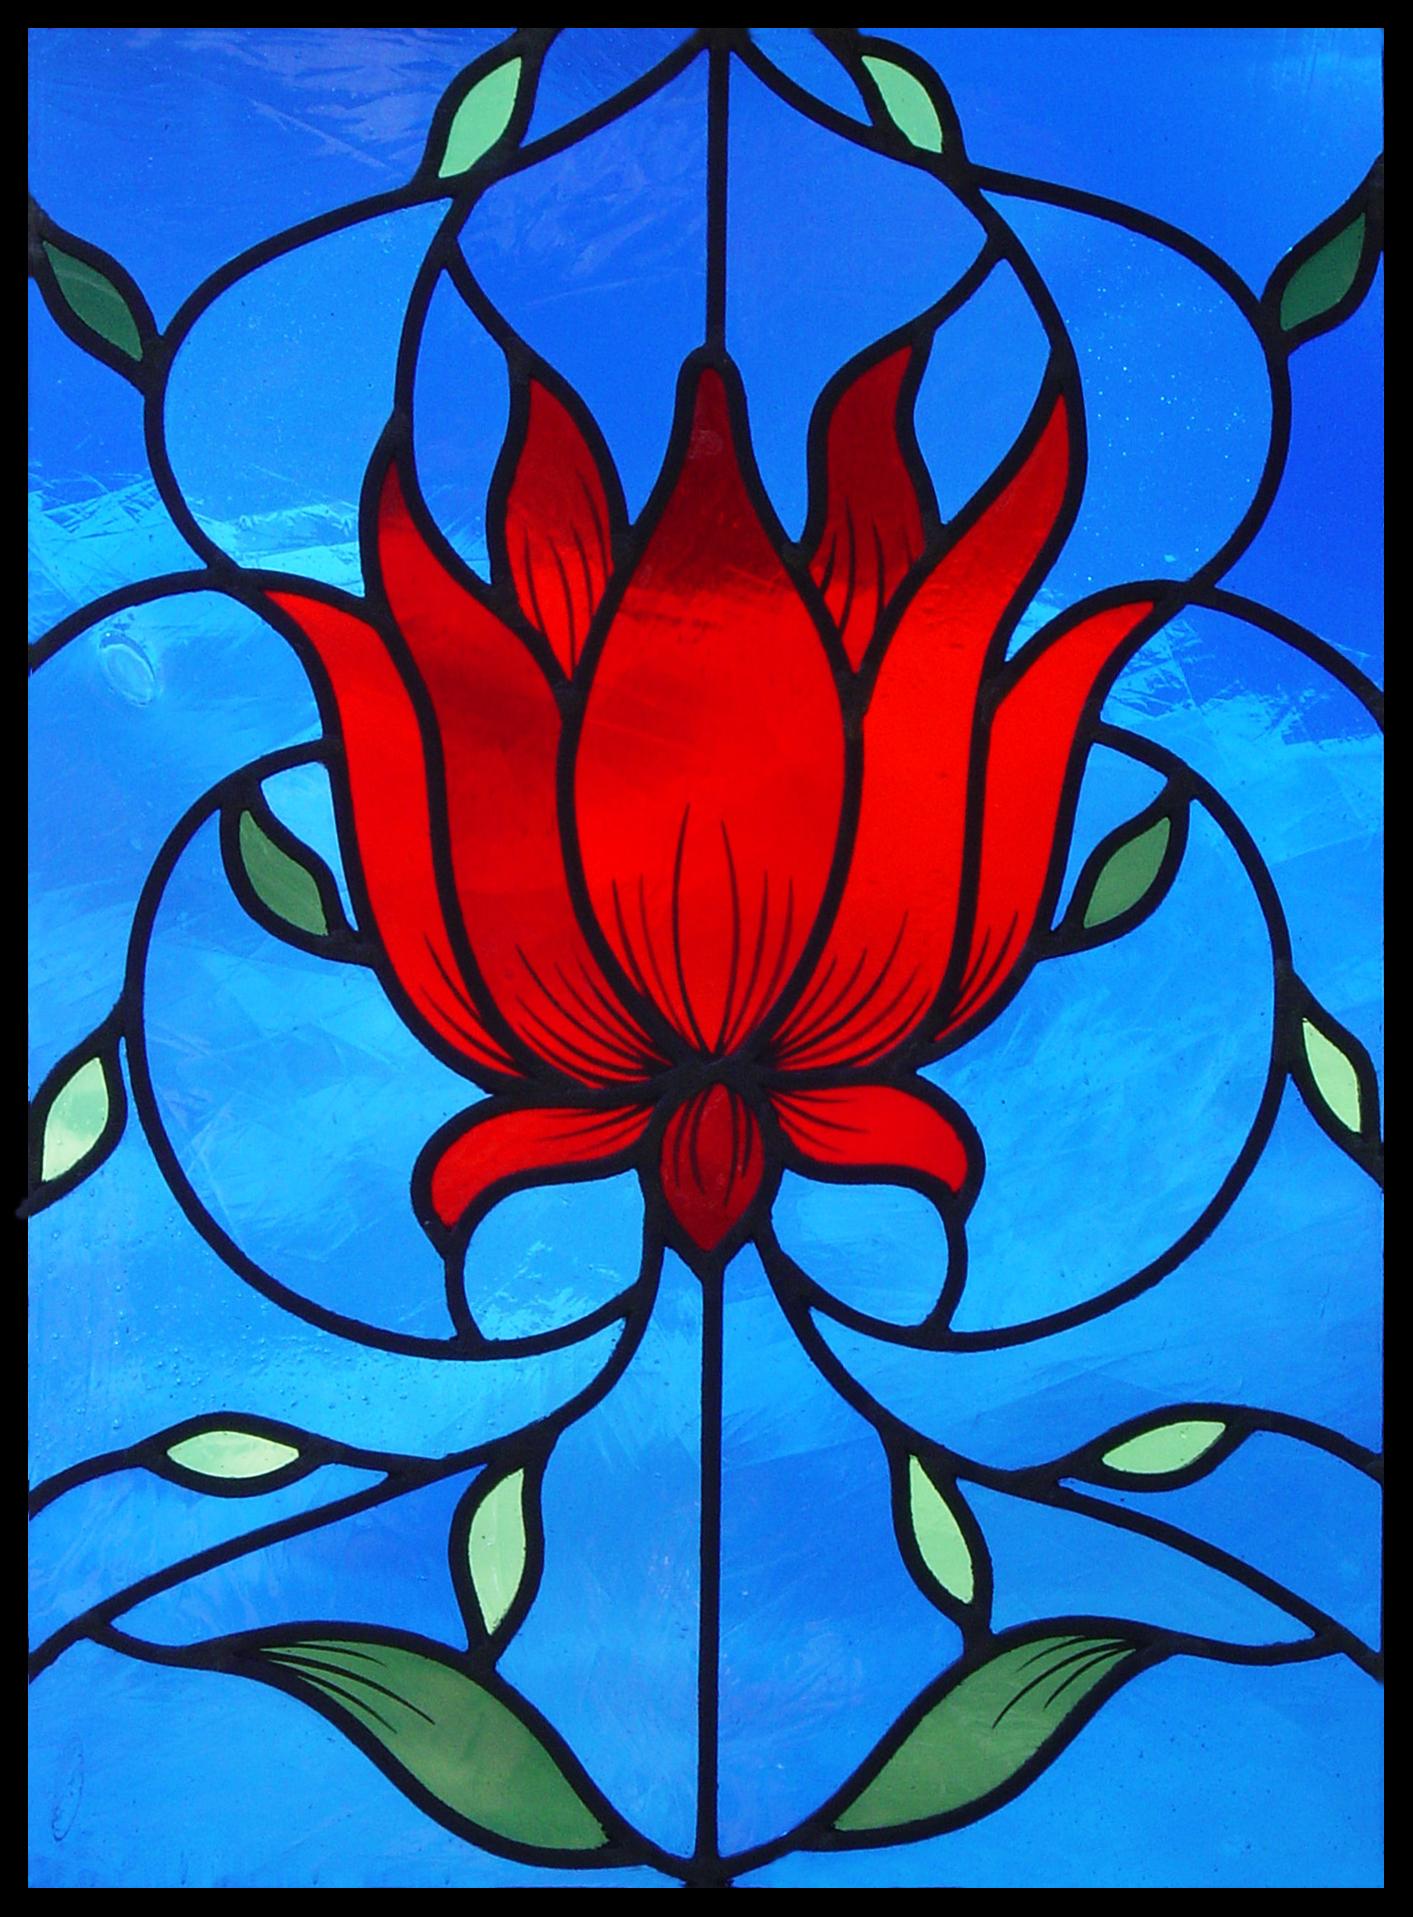 Red Lotus panel after William Morris.